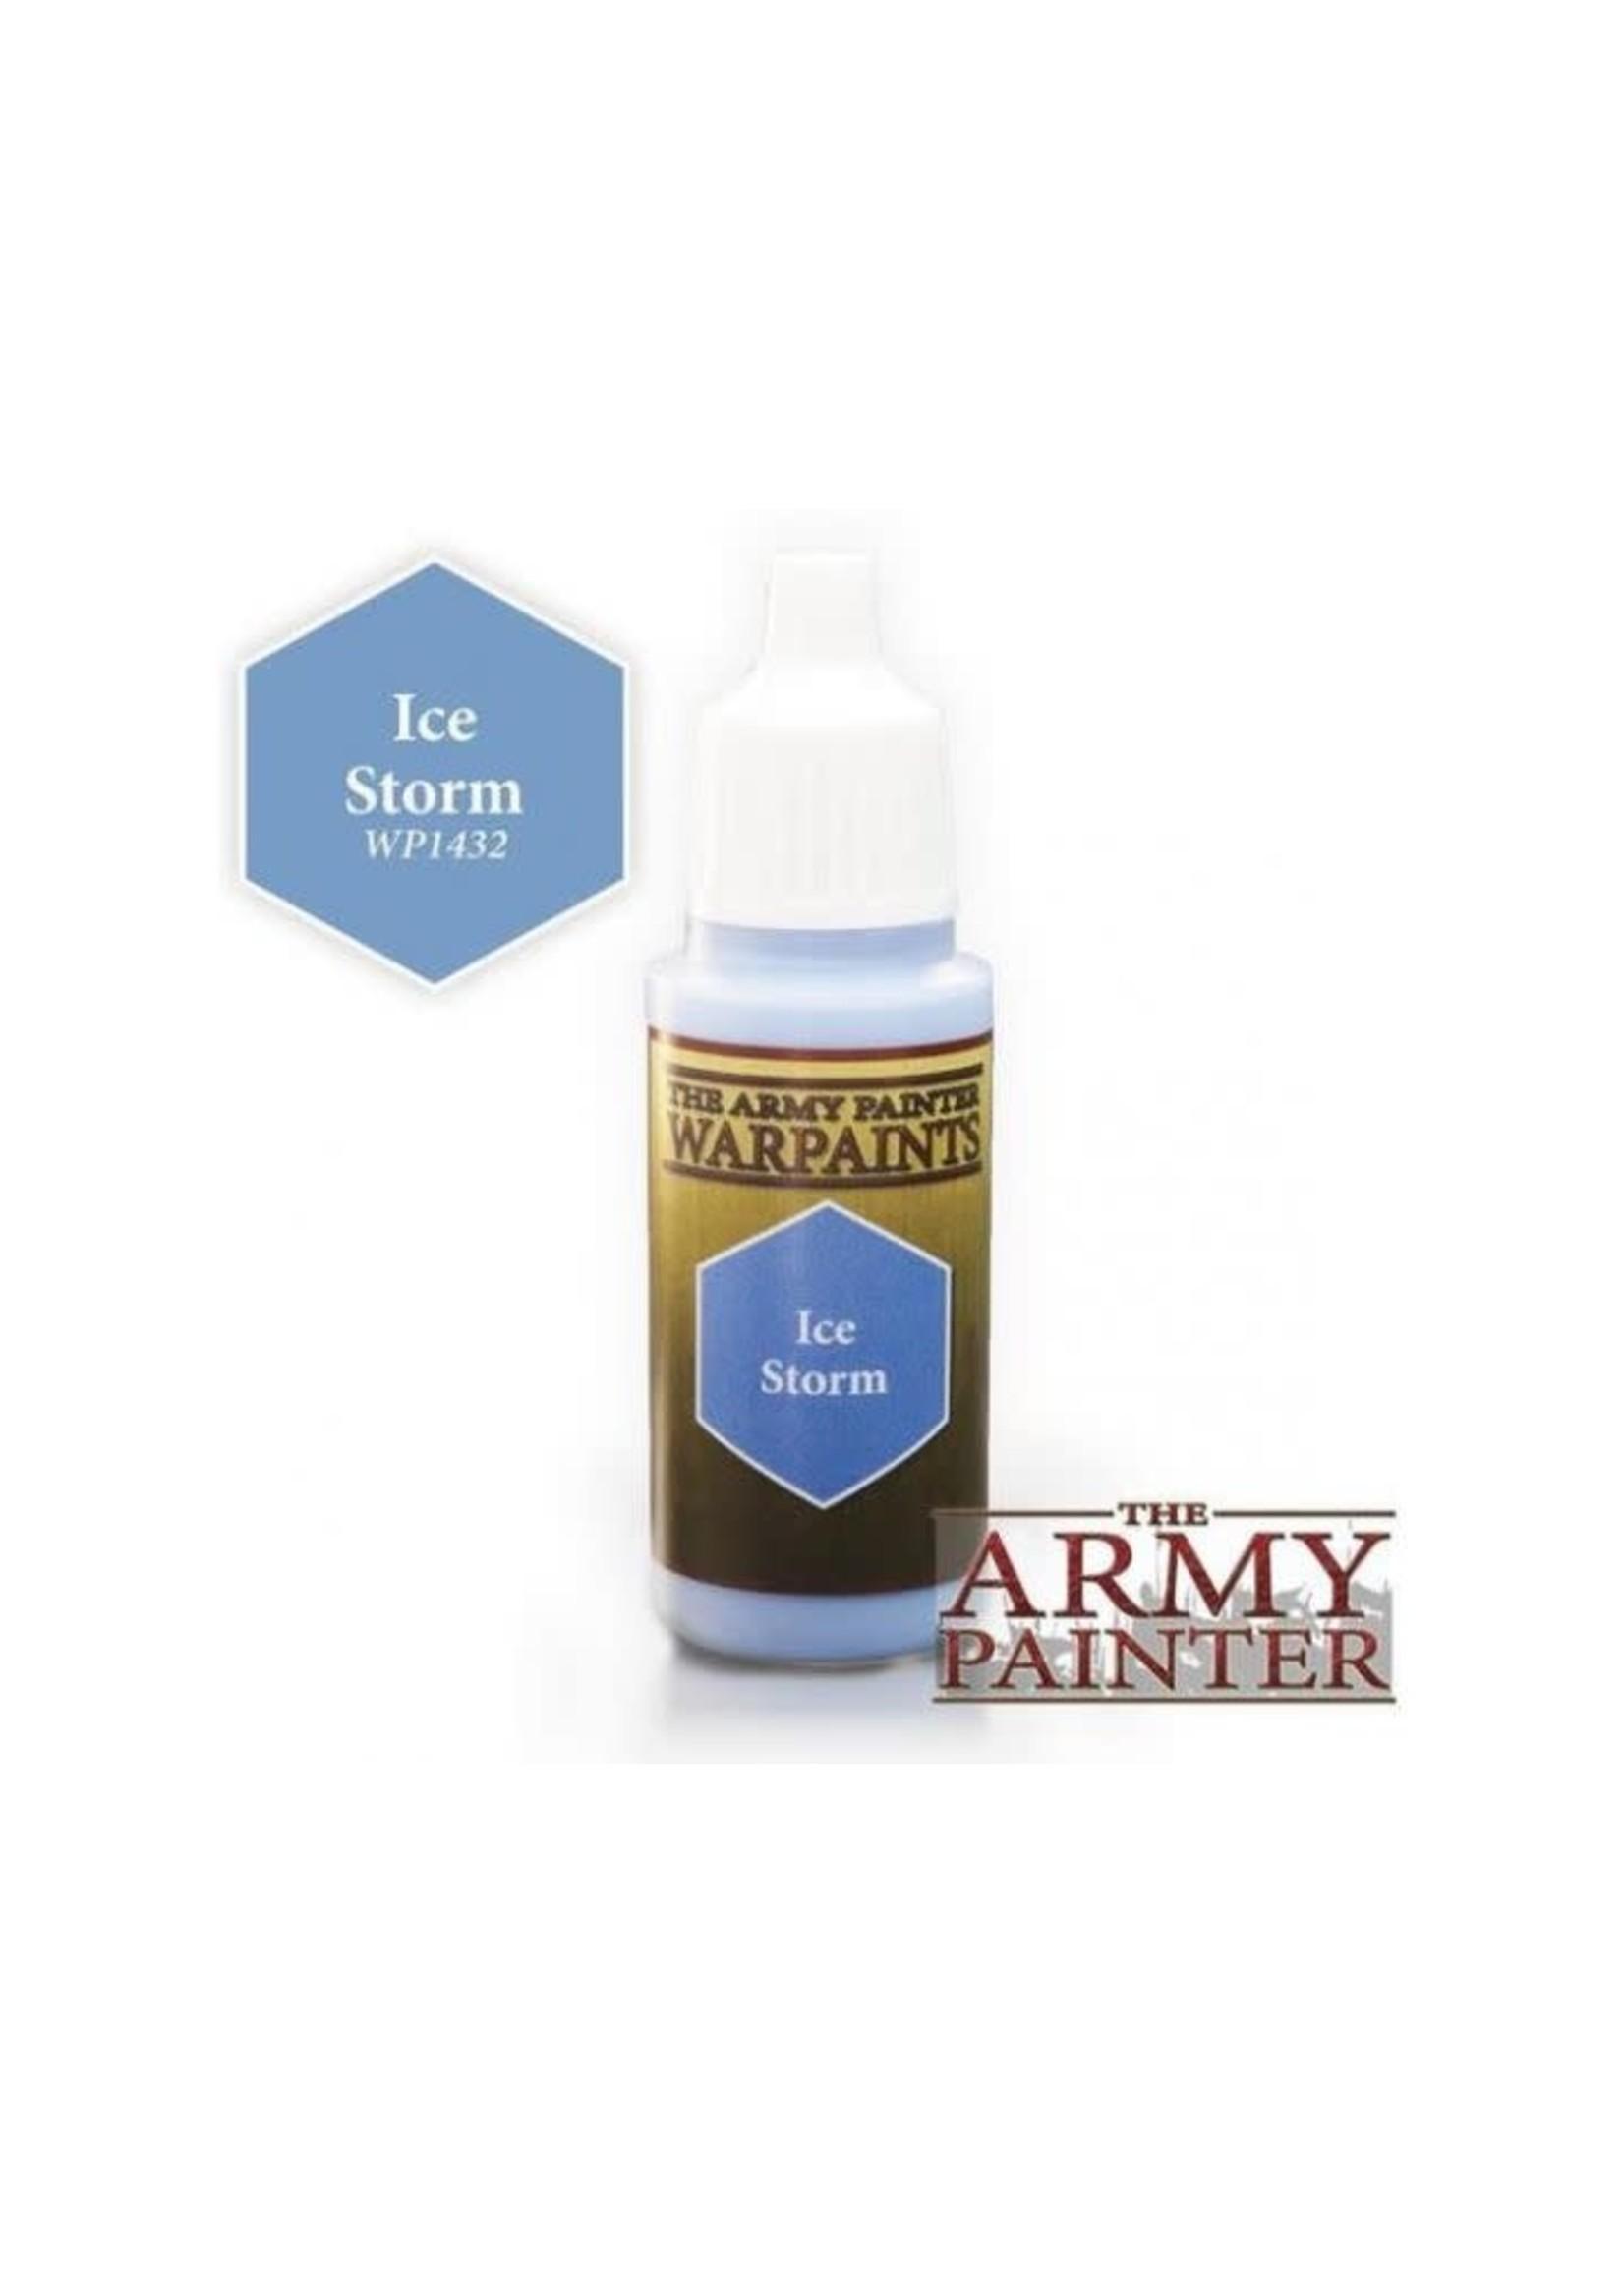 Army Painter Warpaints - Ice Storm